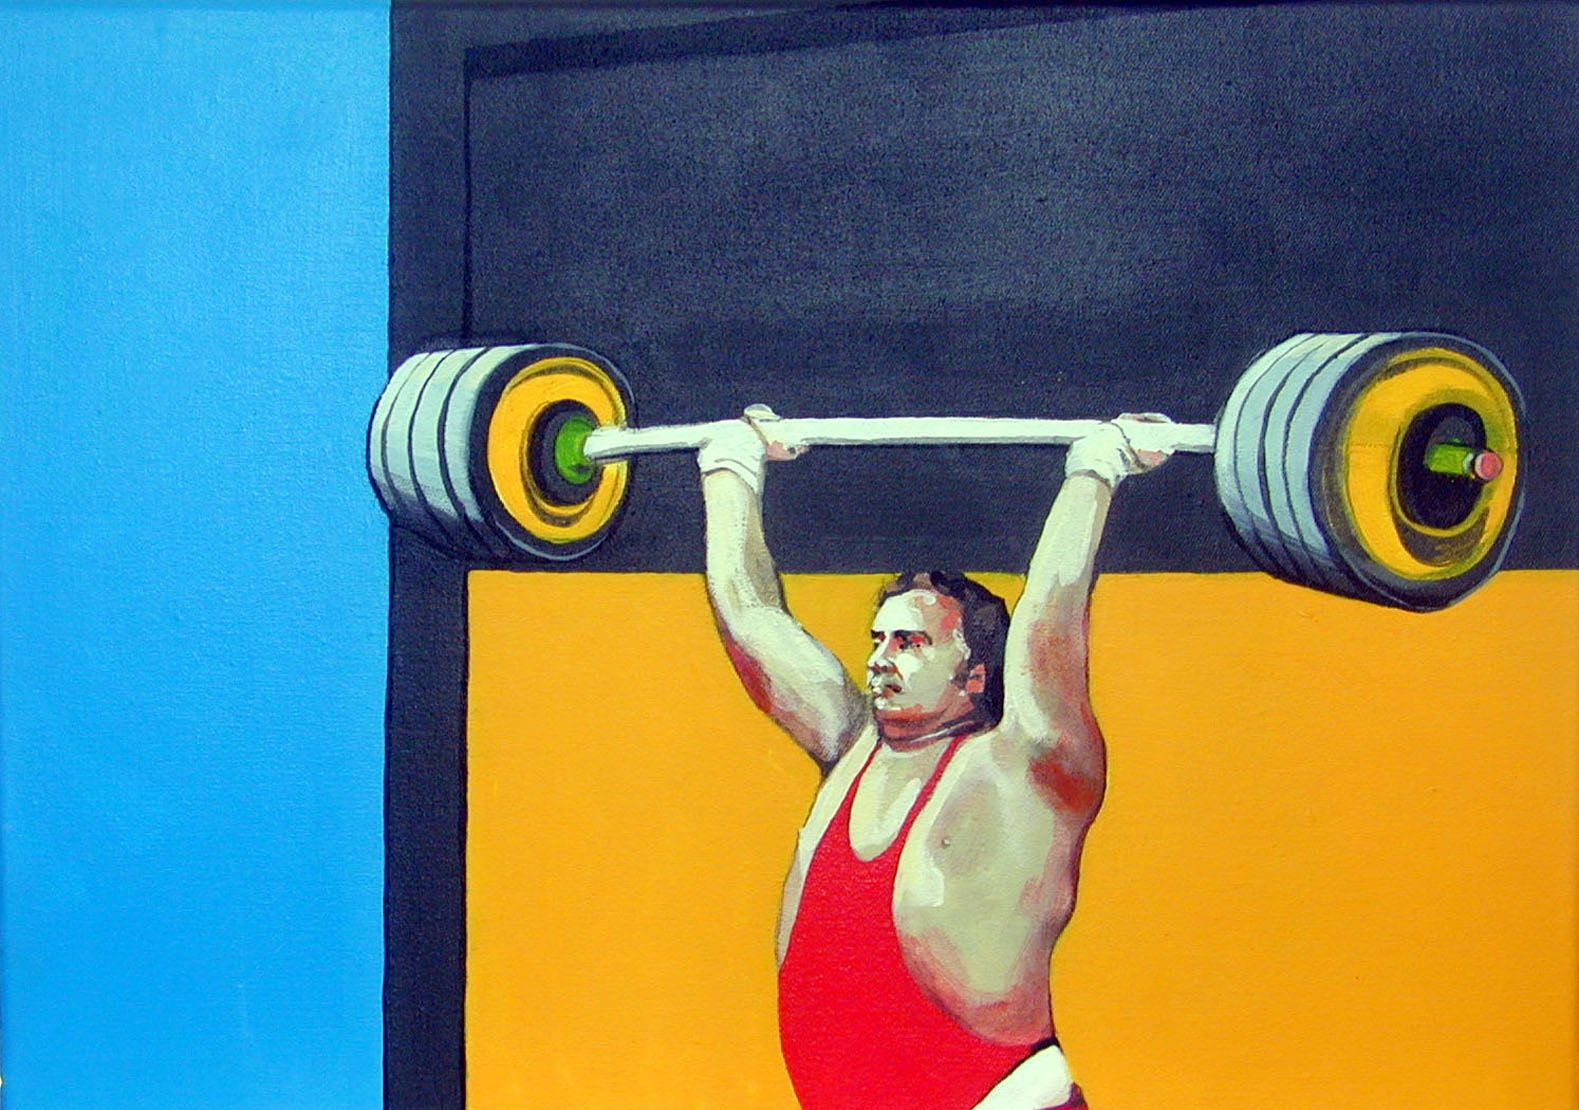 portrait of a gymnast wearing red by franziska holstein